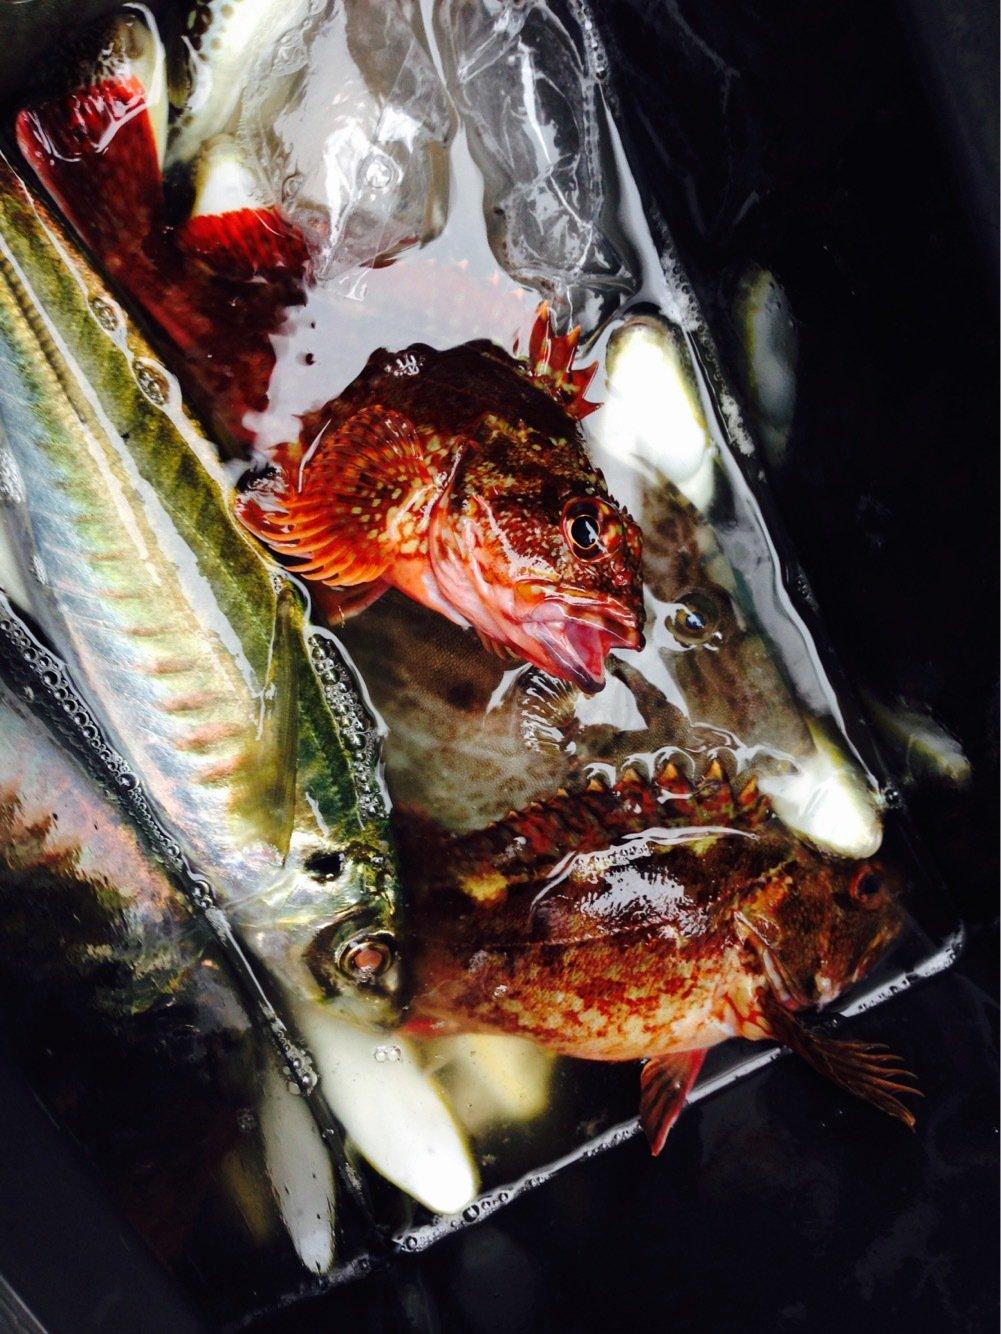 totoshyさんの投稿画像,写っている魚はショウサイフグ